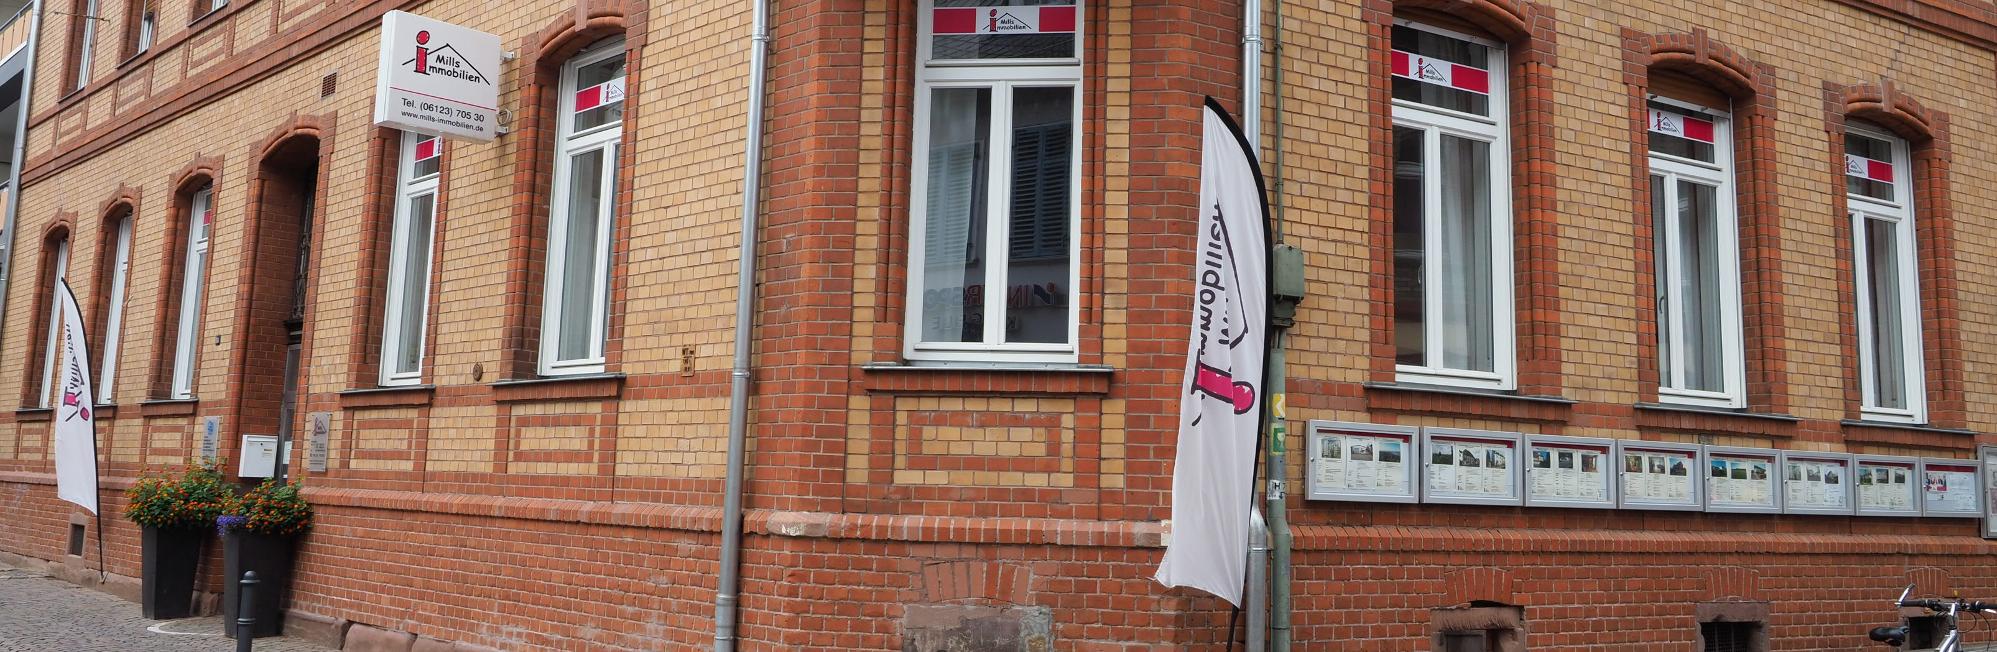 Mills Immobilien Foto Büro in Eltville (Rheingau)